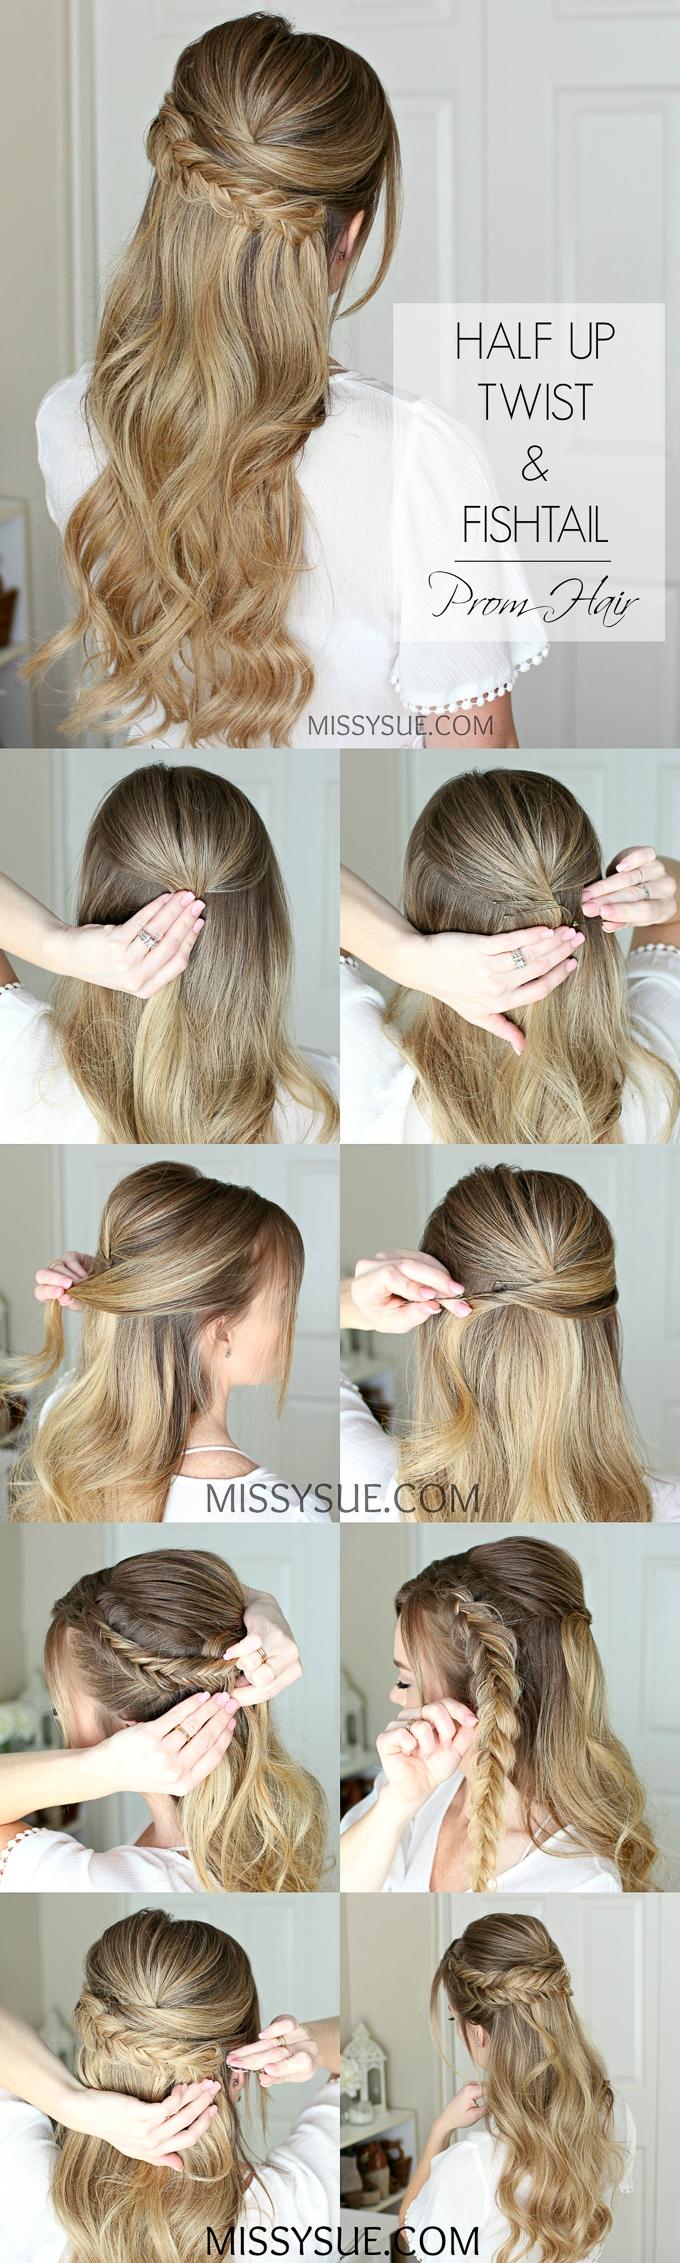 Easy Half Up Prom Hair Missy Sue